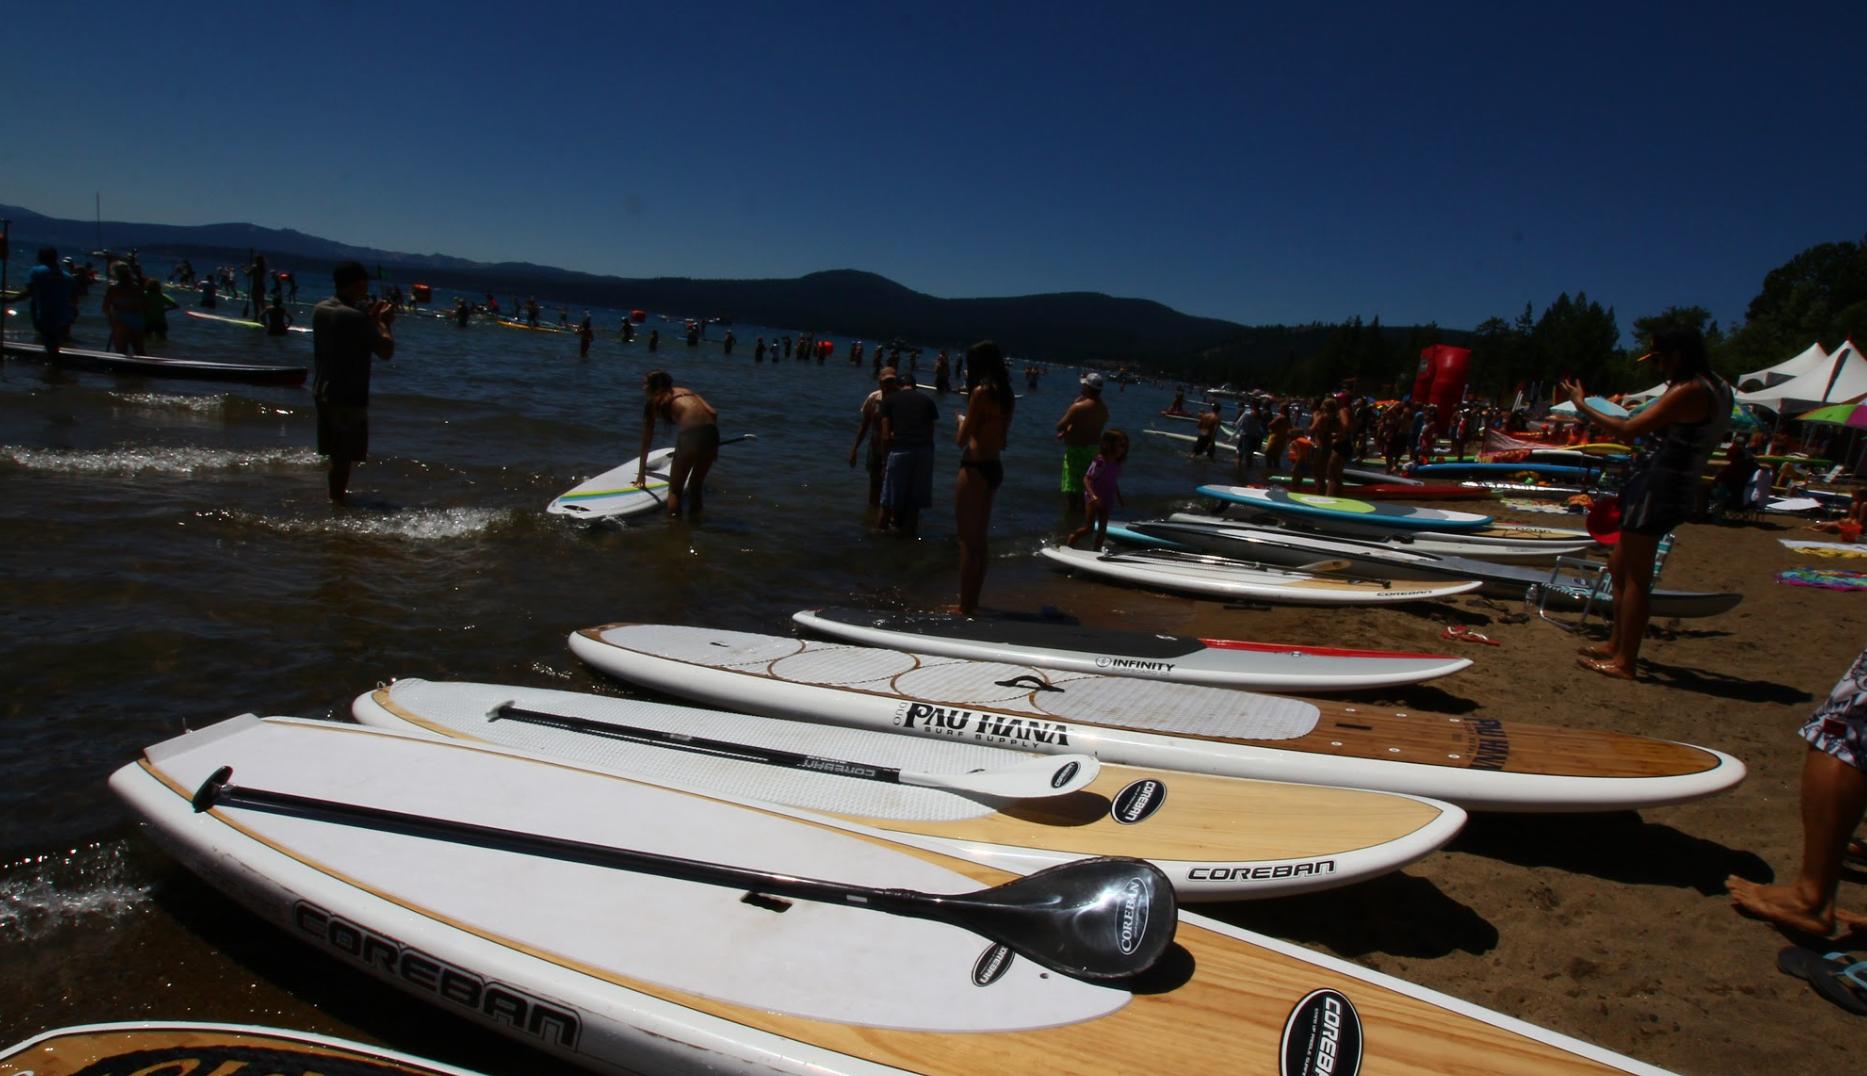 SUP lineup in tahoe